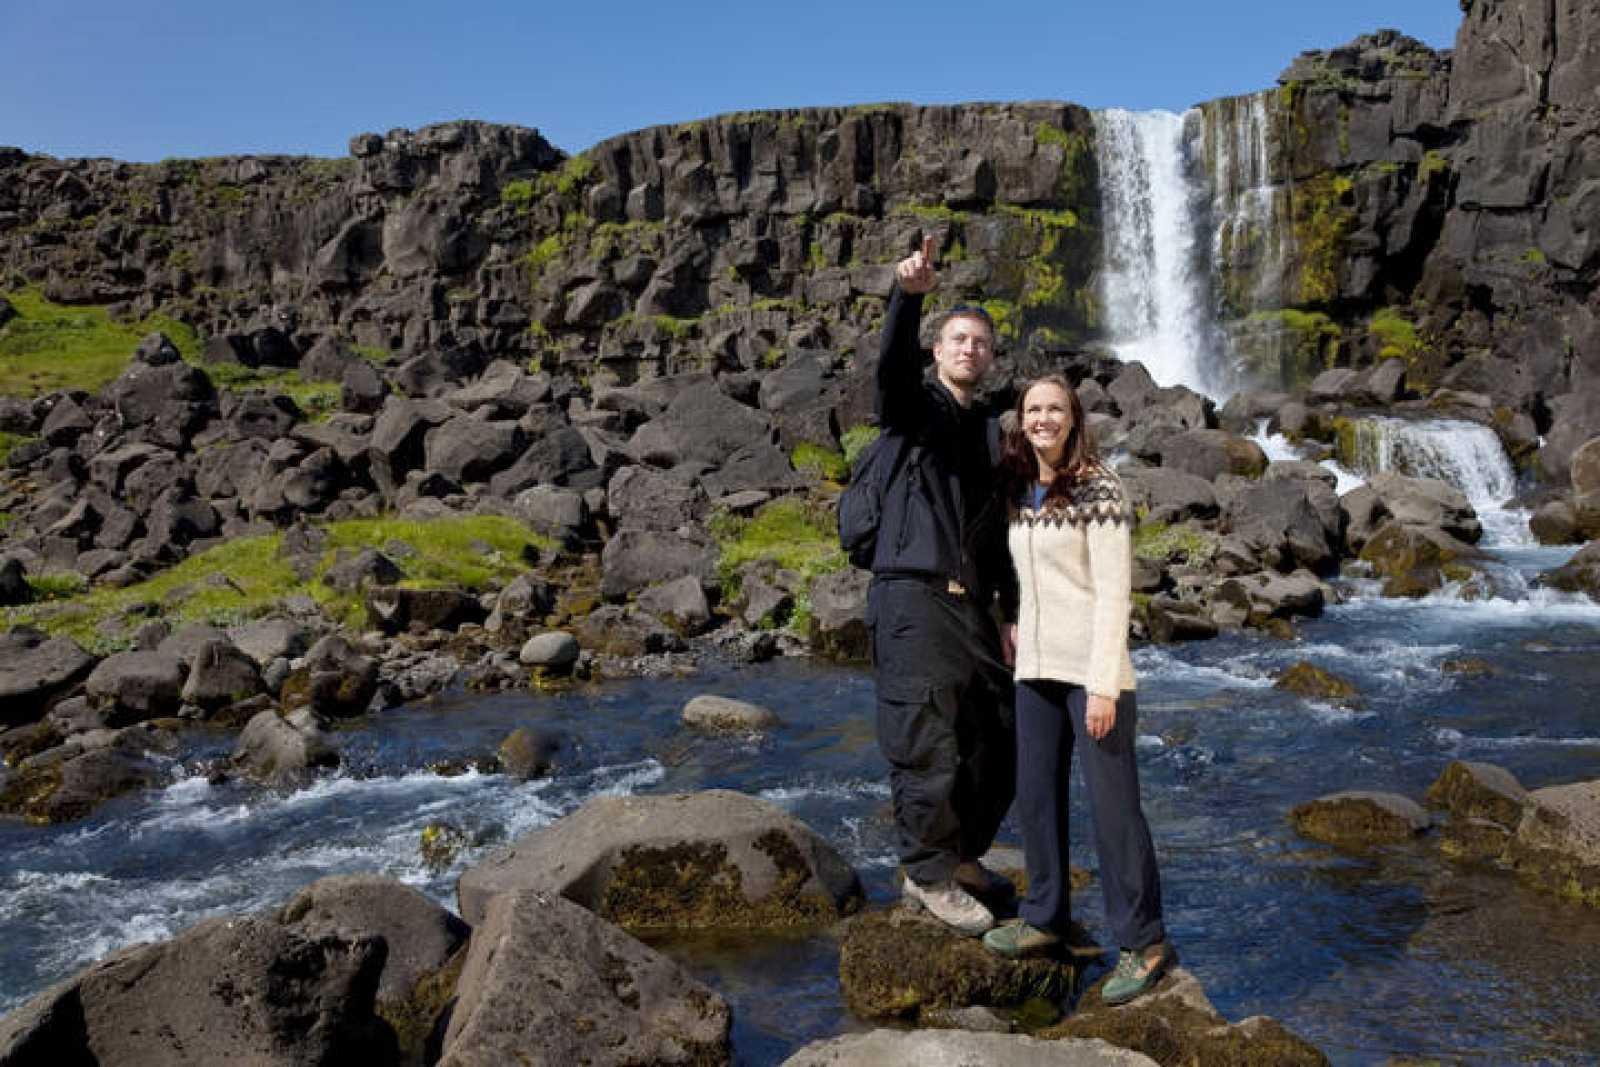 Una pareja junto a una cascada en Islandia